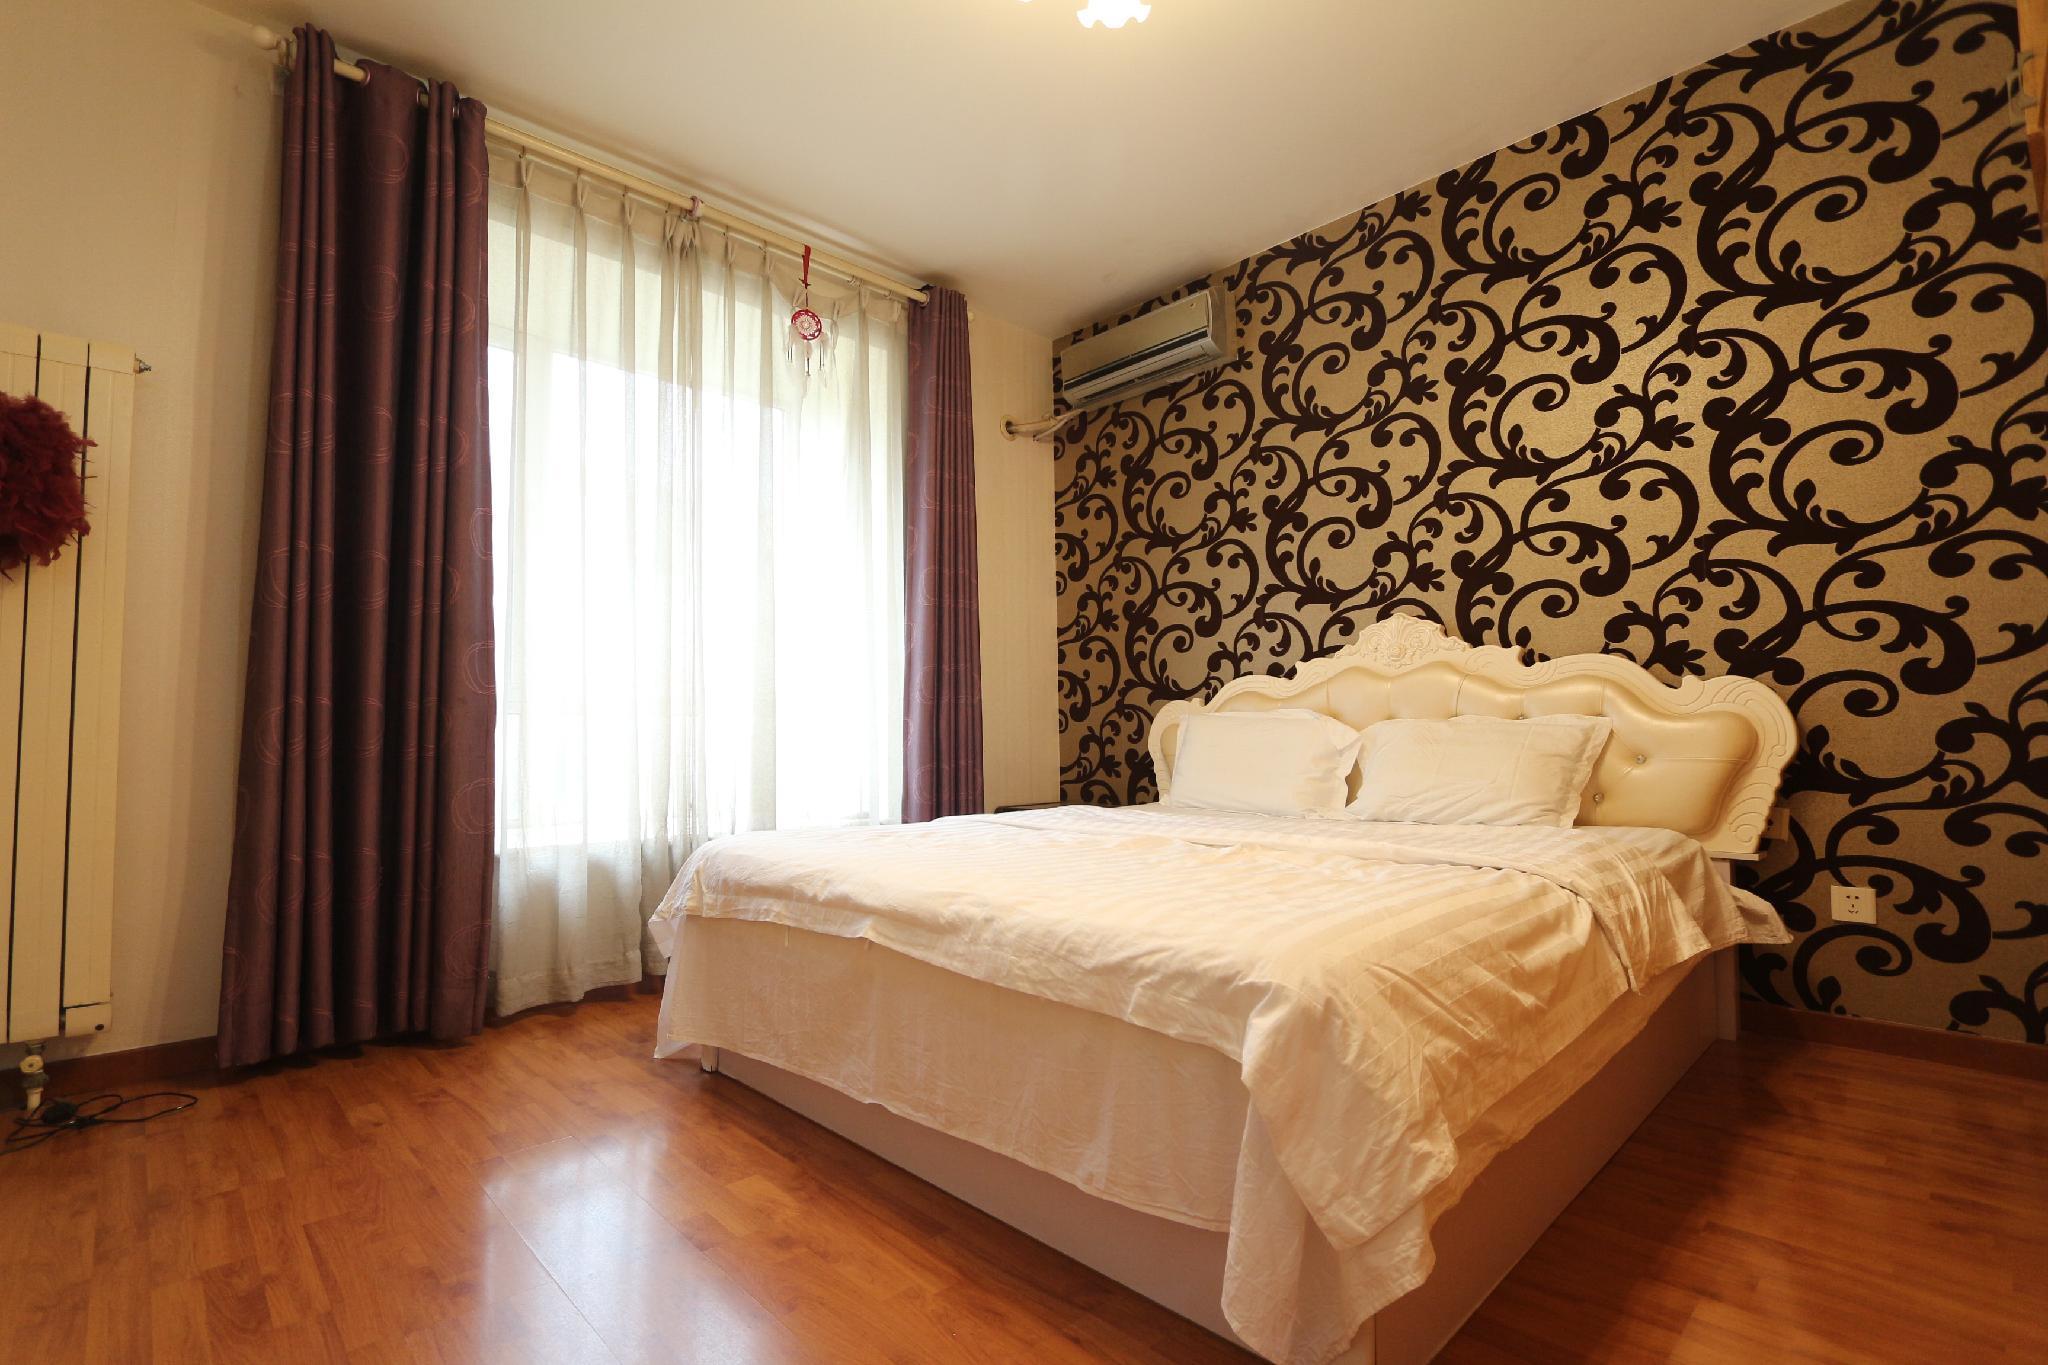 A304 Wyatt City 2 Bedroom Apartment